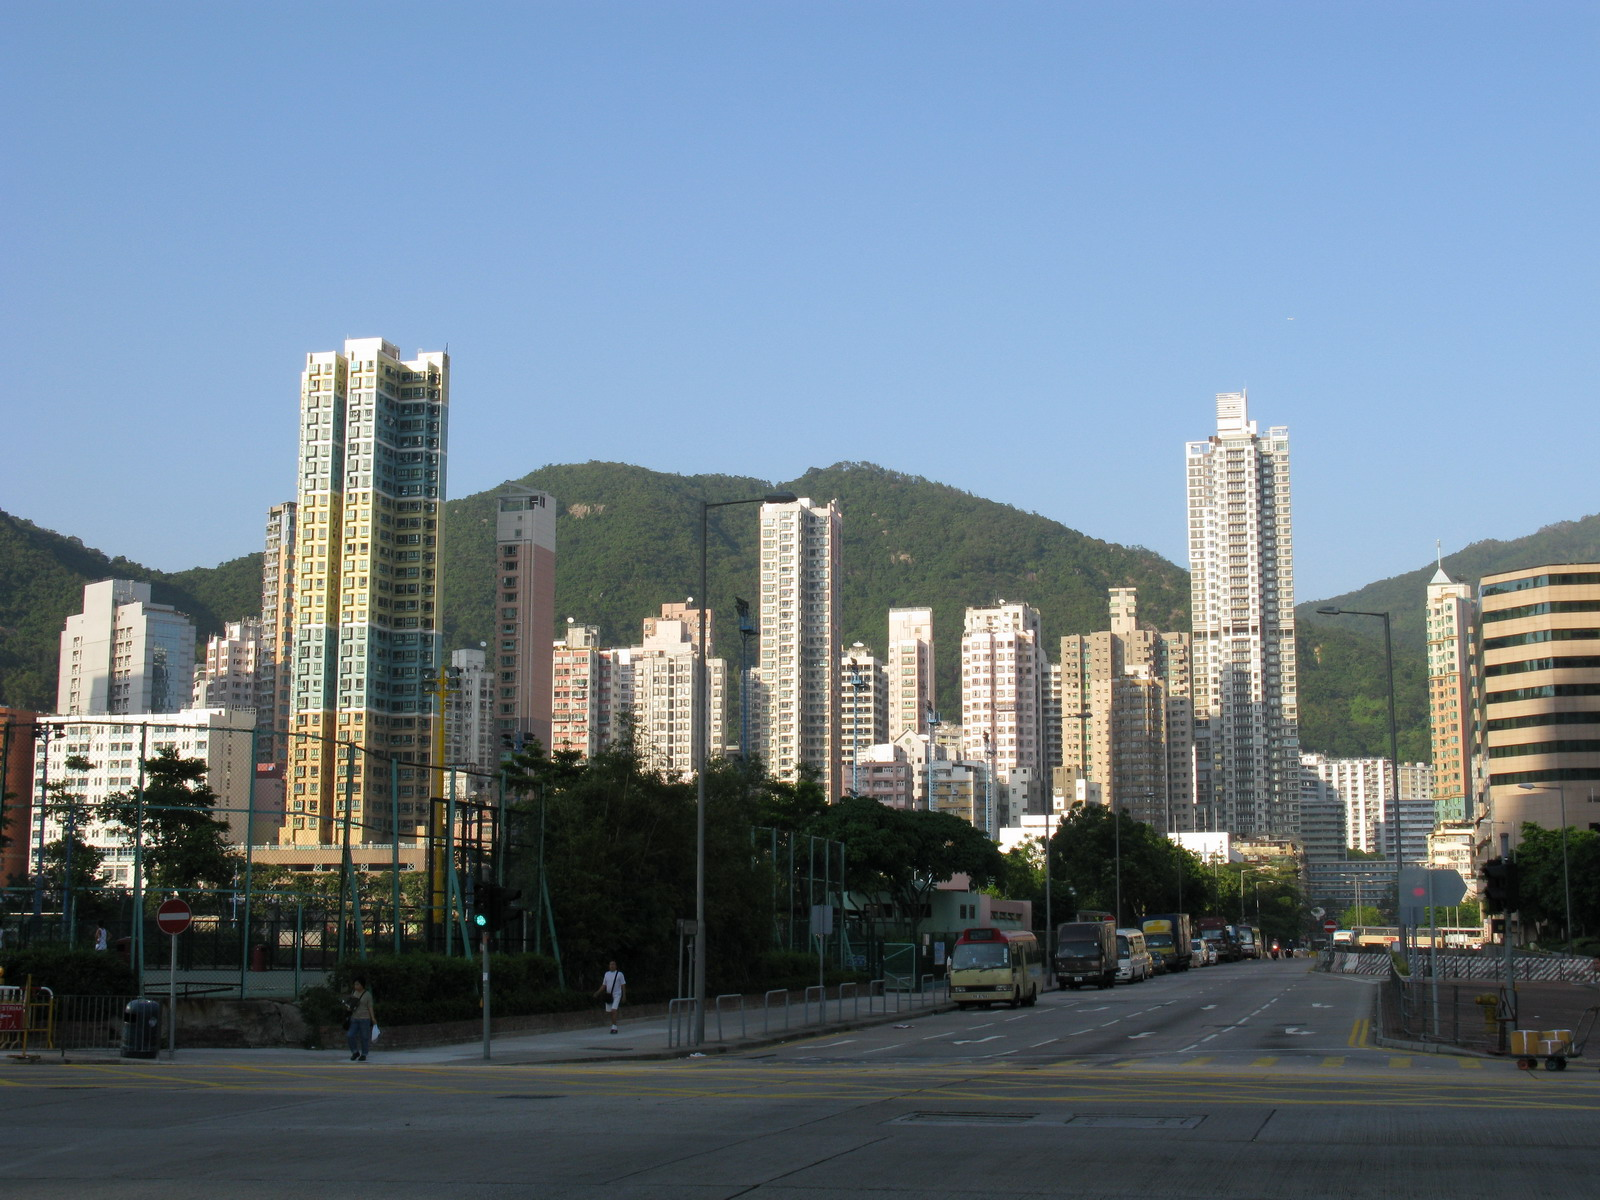 File:Cheung Sha Wan Hing Wah Street.jpg - Wikimedia Commons